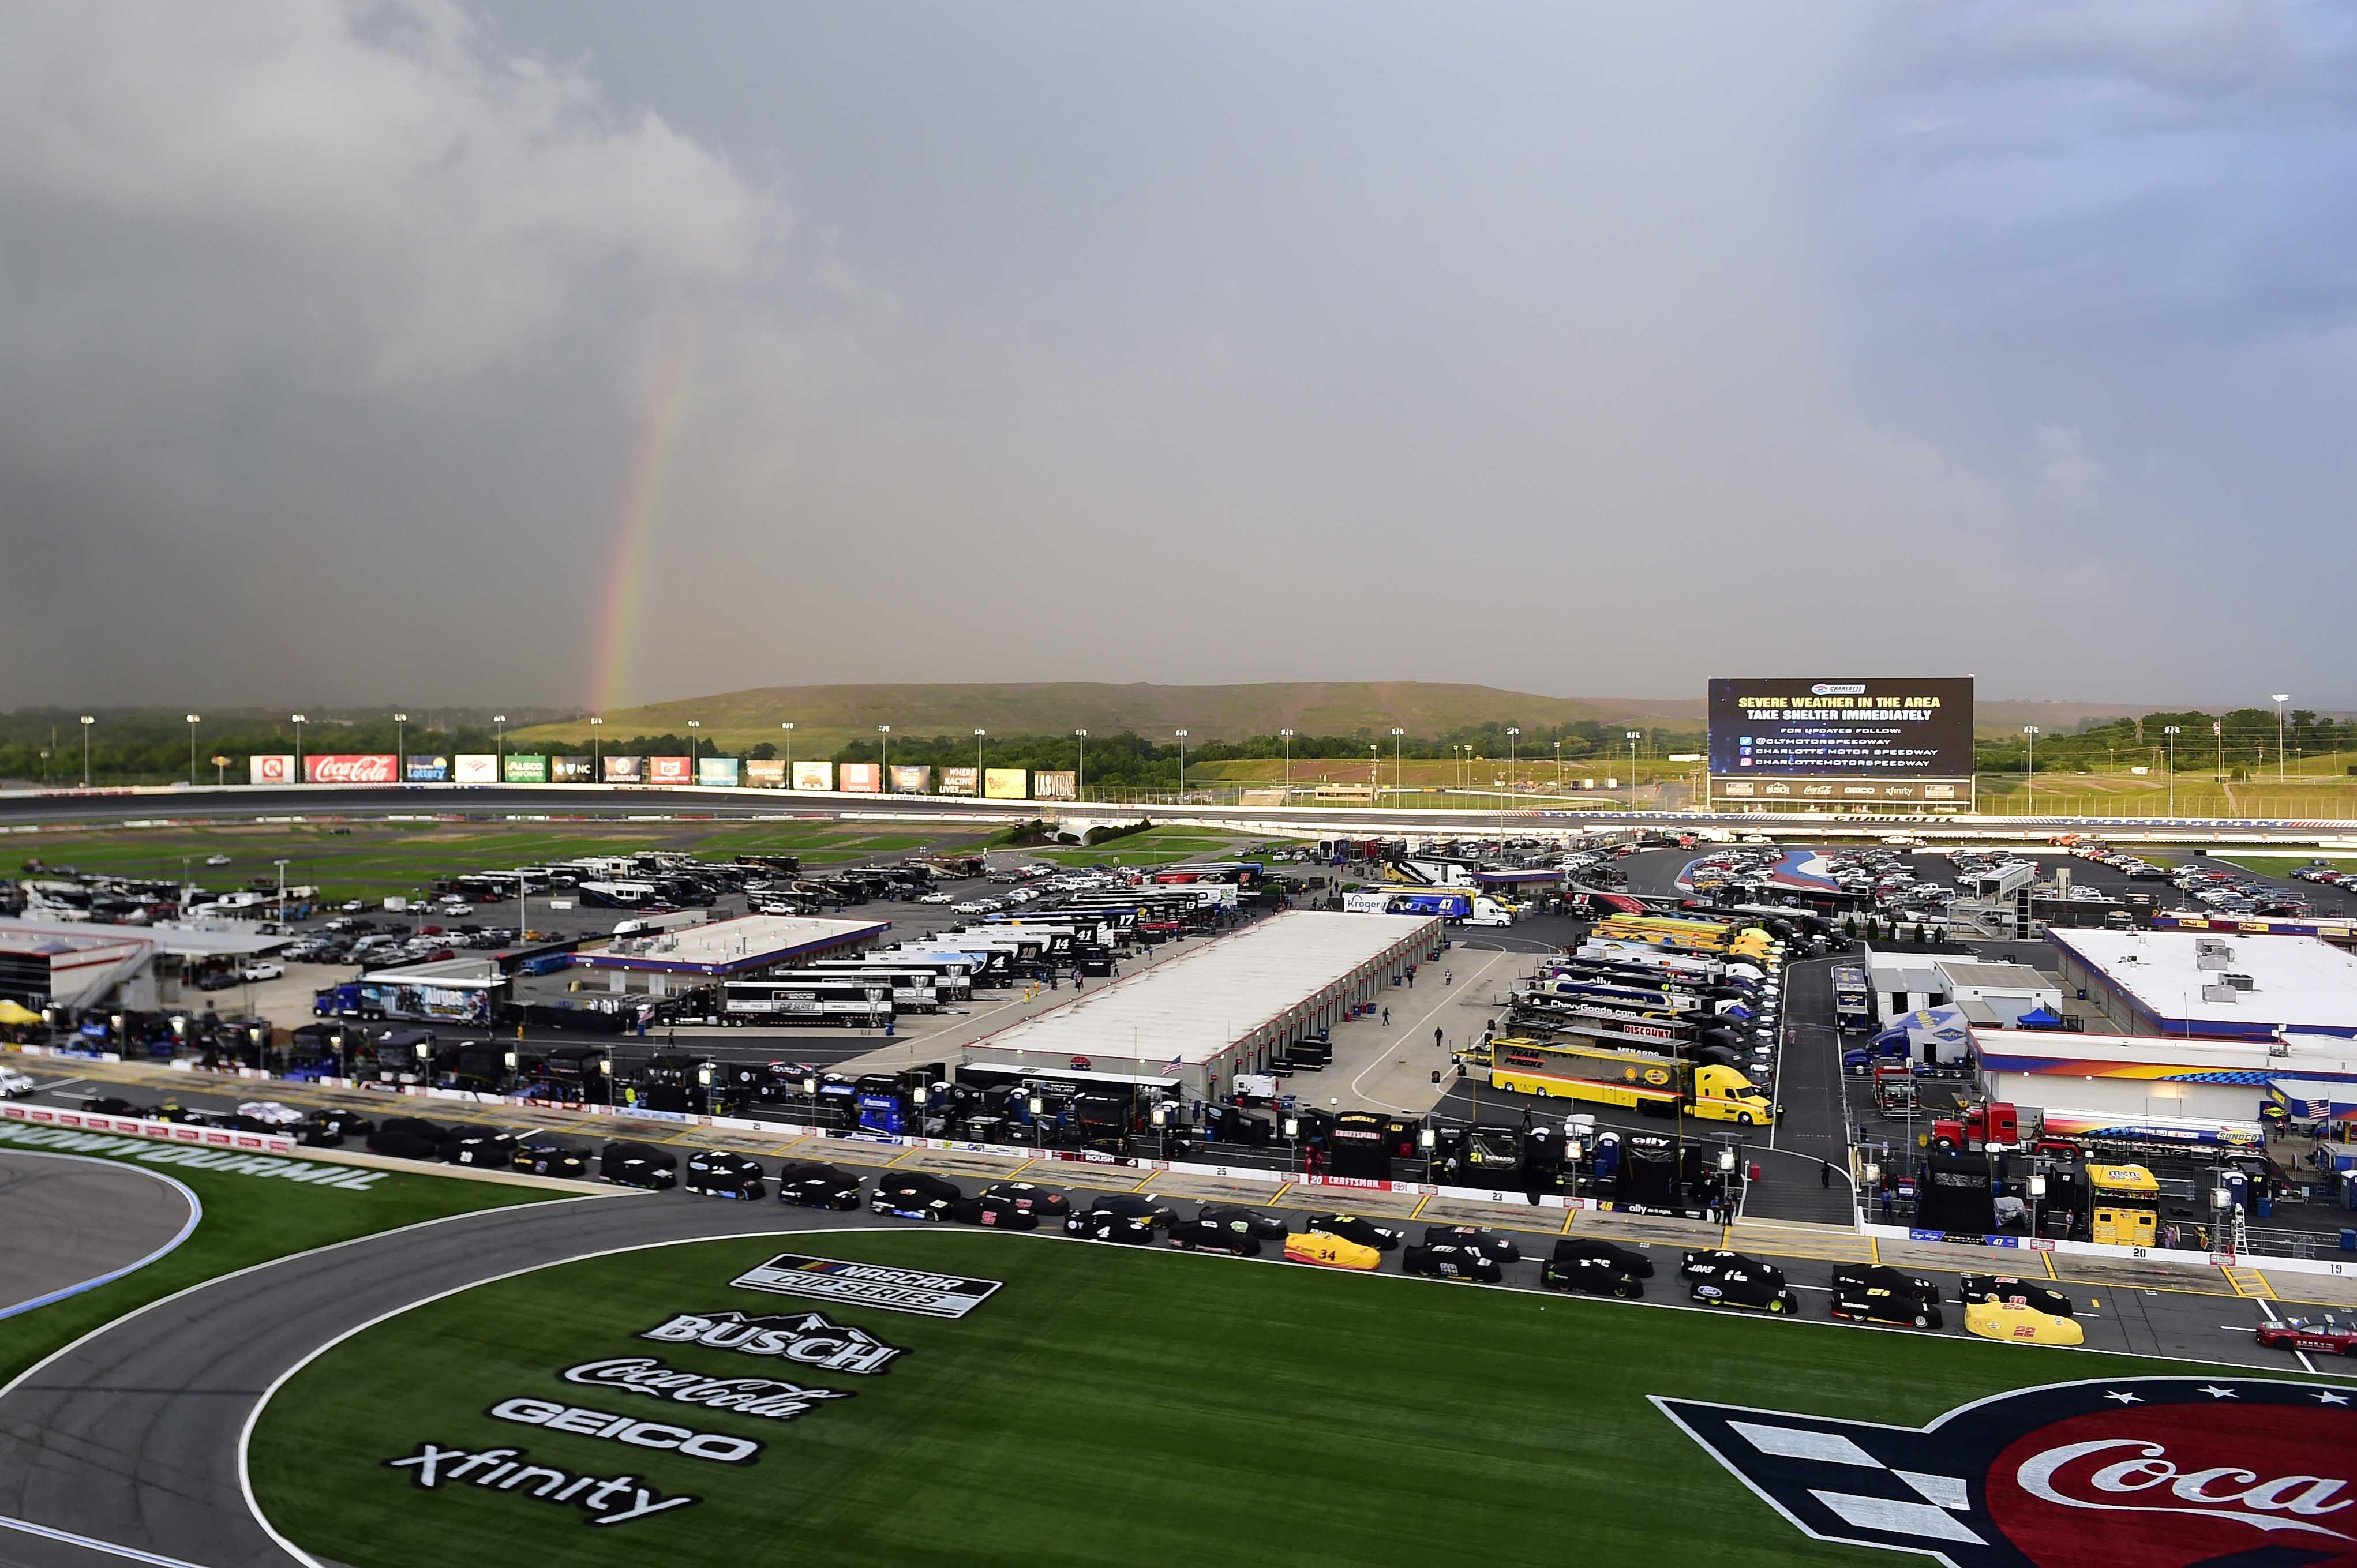 Rainbow at Charlotte Motor Speedway - Rain delay